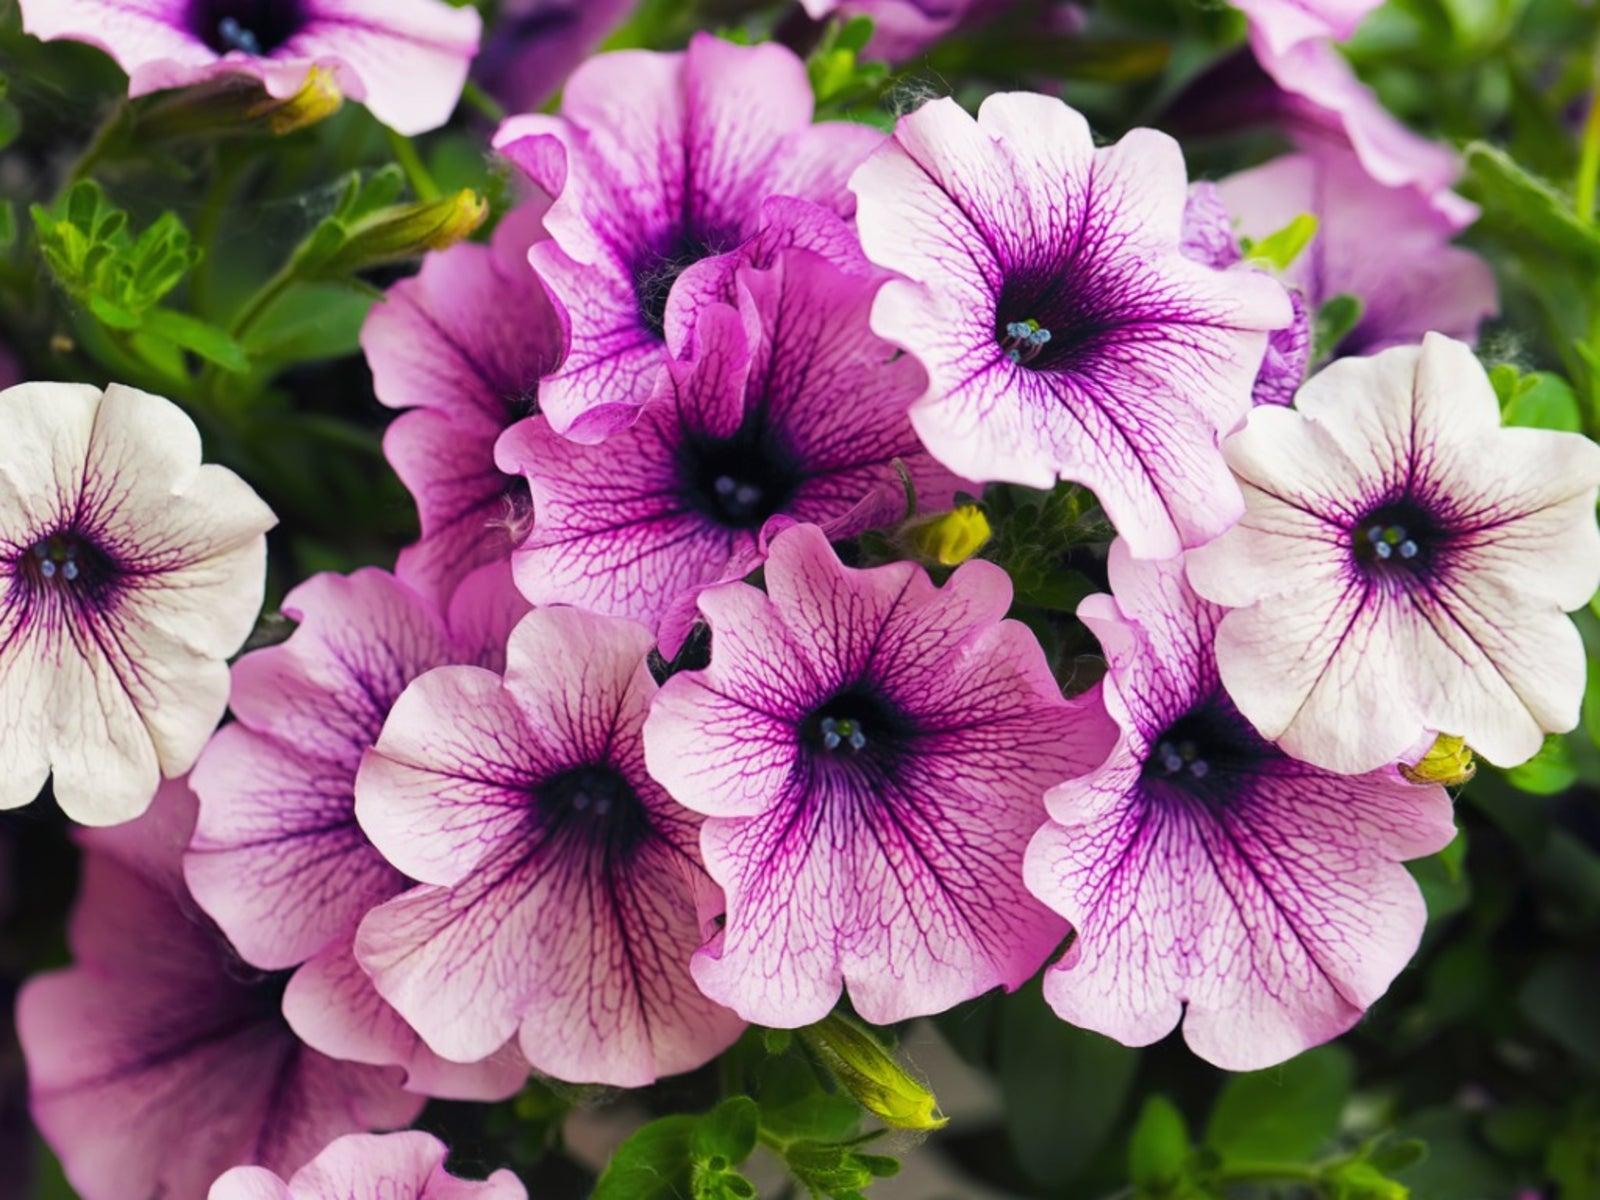 Growing Petunias Tips For Petunia Care